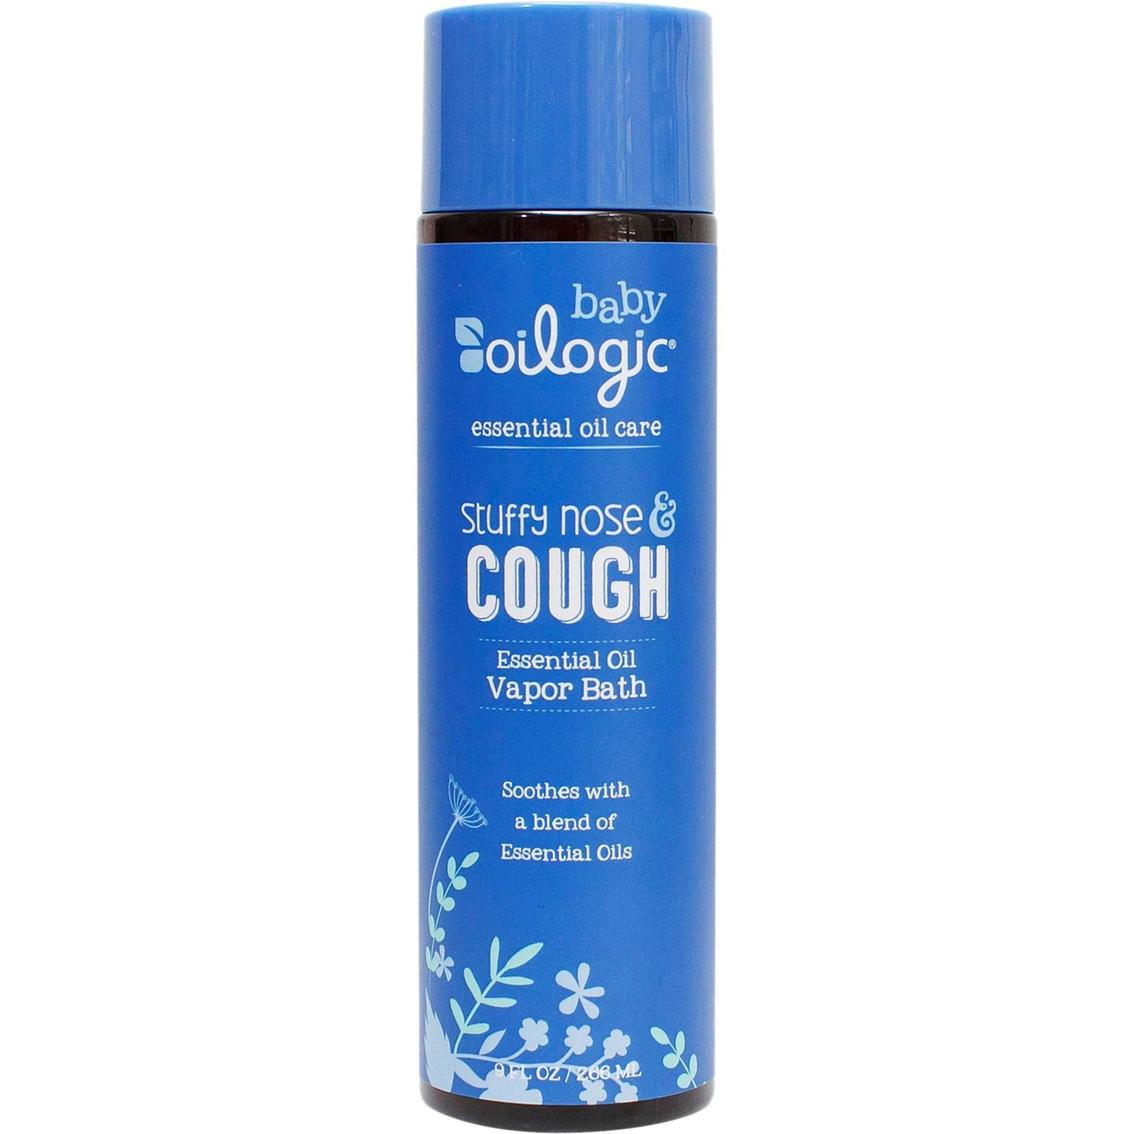 Oilogic 9 Oz Stuffy Nose And Cough Essential Oil Vapor Bath Medicinal Oils Baby Toys Shop The Exchange